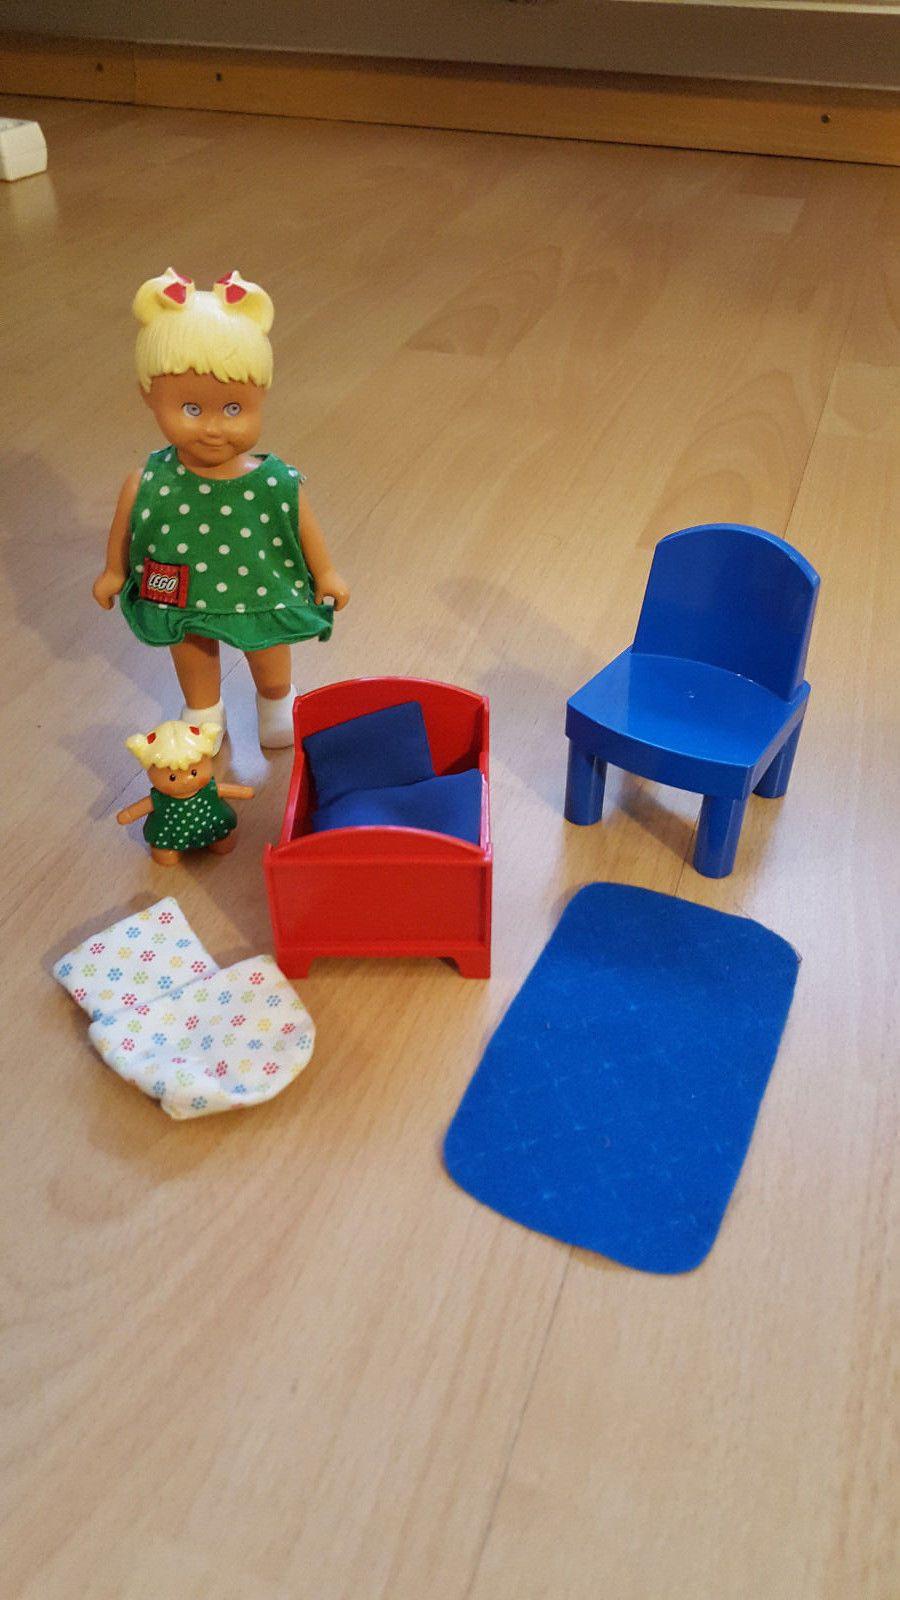 Lego duplo explore set 2953 puppe anna mit kind - Kinderbett set ...